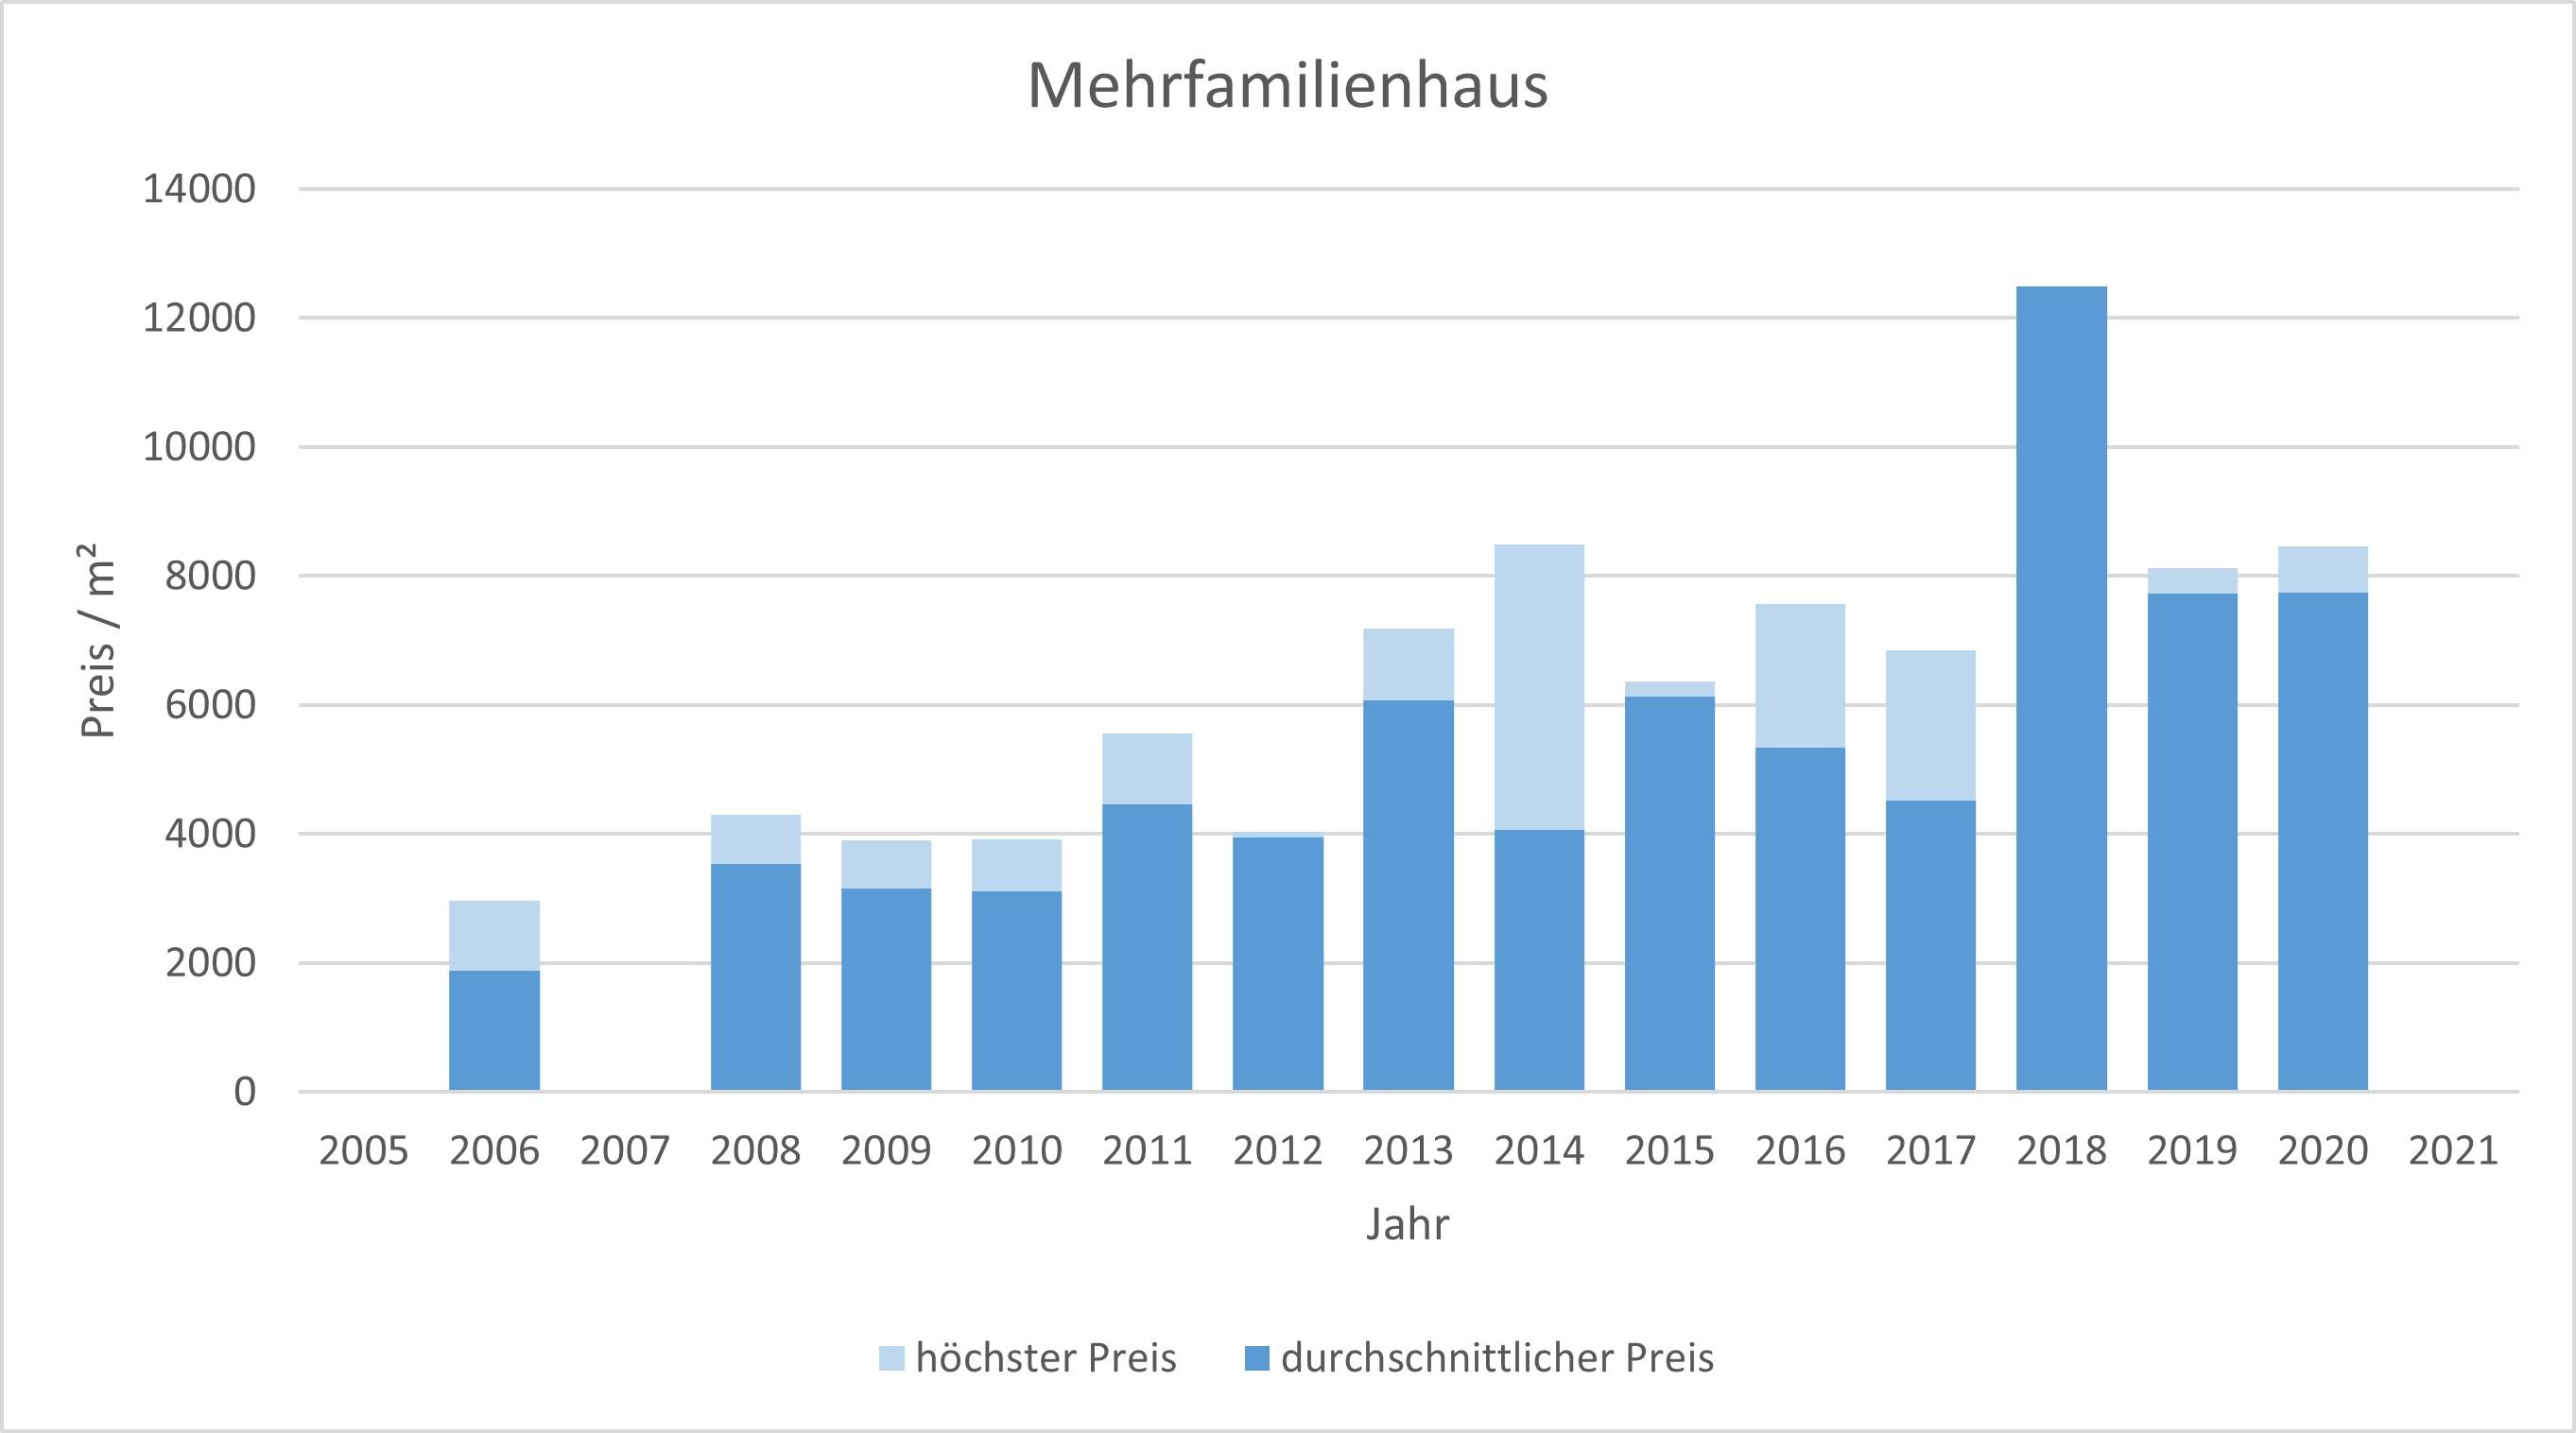 Oberhaching Mehrfamilienhaus kaufen verkaufen Preis Bewertung Makler 2019 2020 2021  www.happy-immo.de